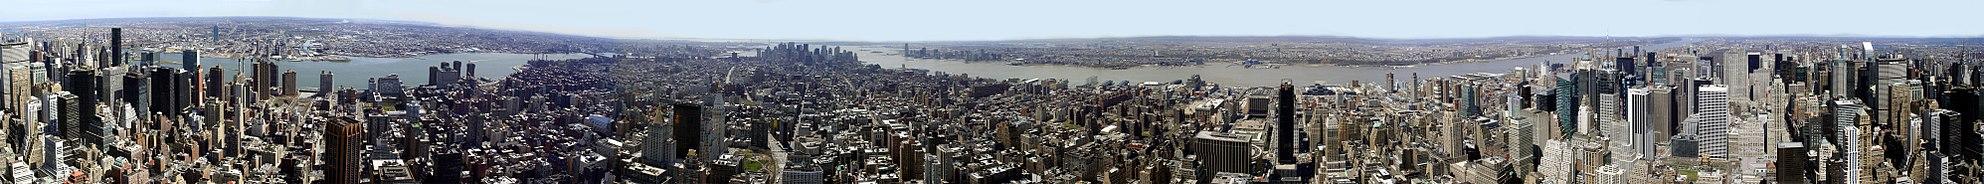 Панорамный снимок 360° Нью-Йорка со здания Эмпайр-стейт-билдинг весной 2005 года.